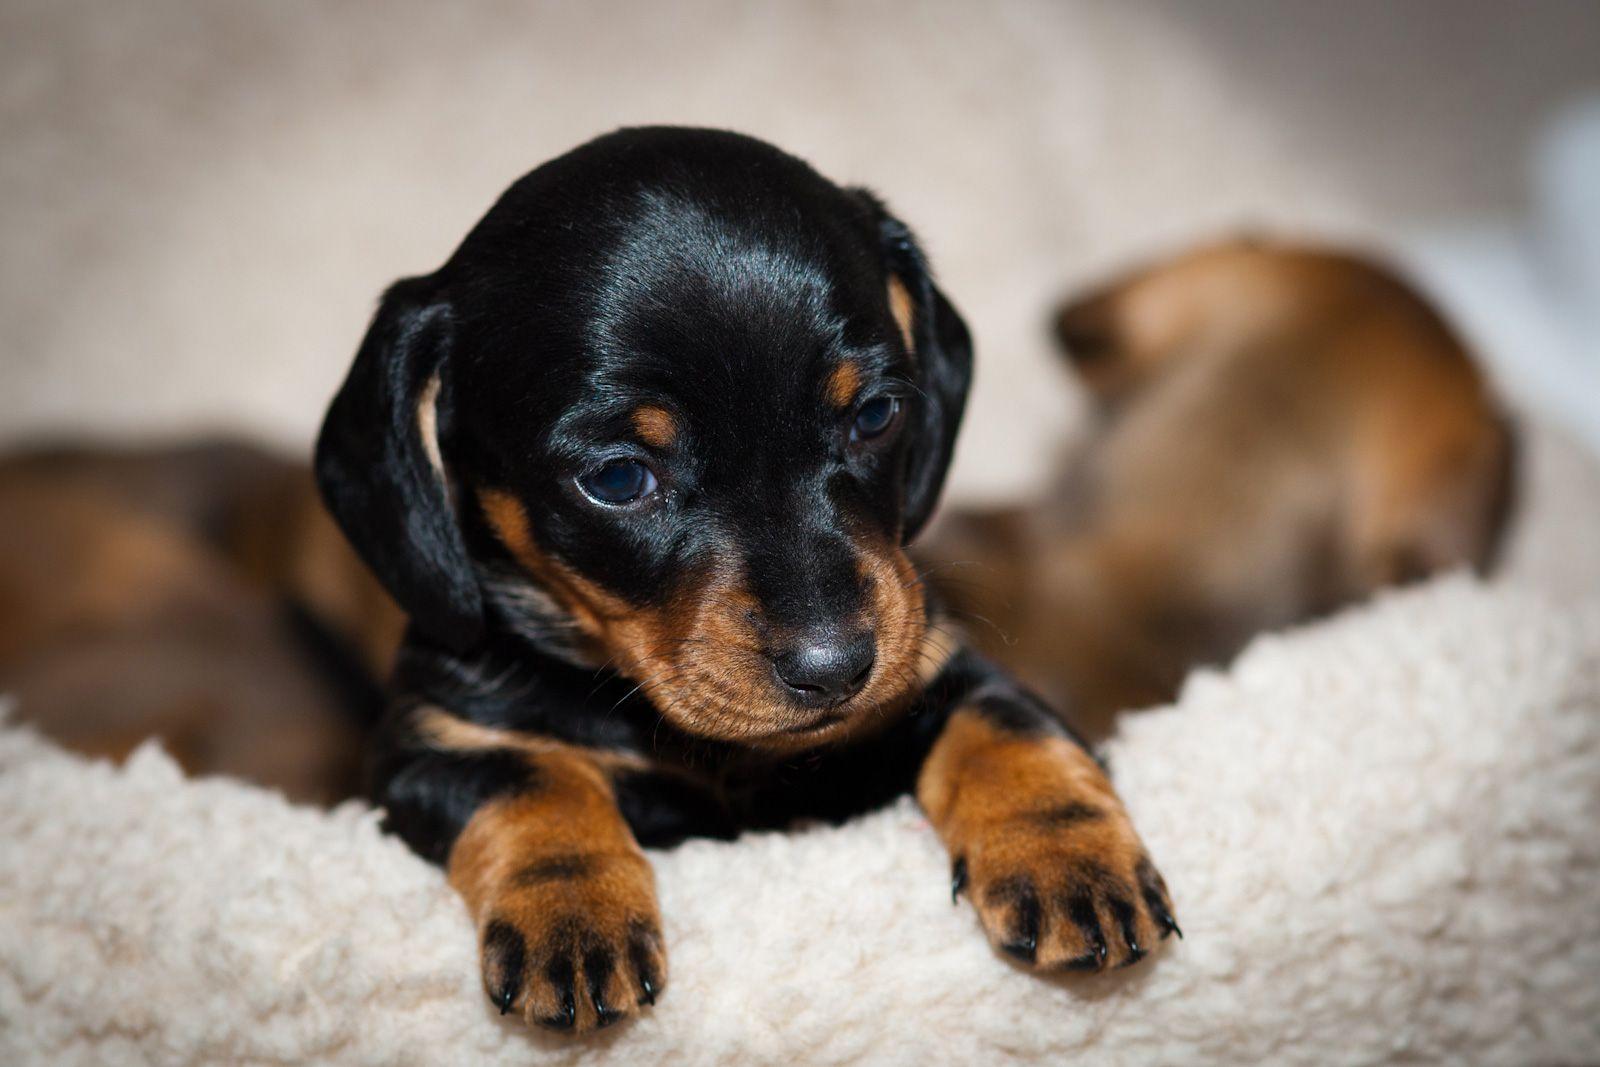 Black Miniature Dachshund Puppies Dachshund Puppies Black And Tan Dachshund Dachshund Puppy